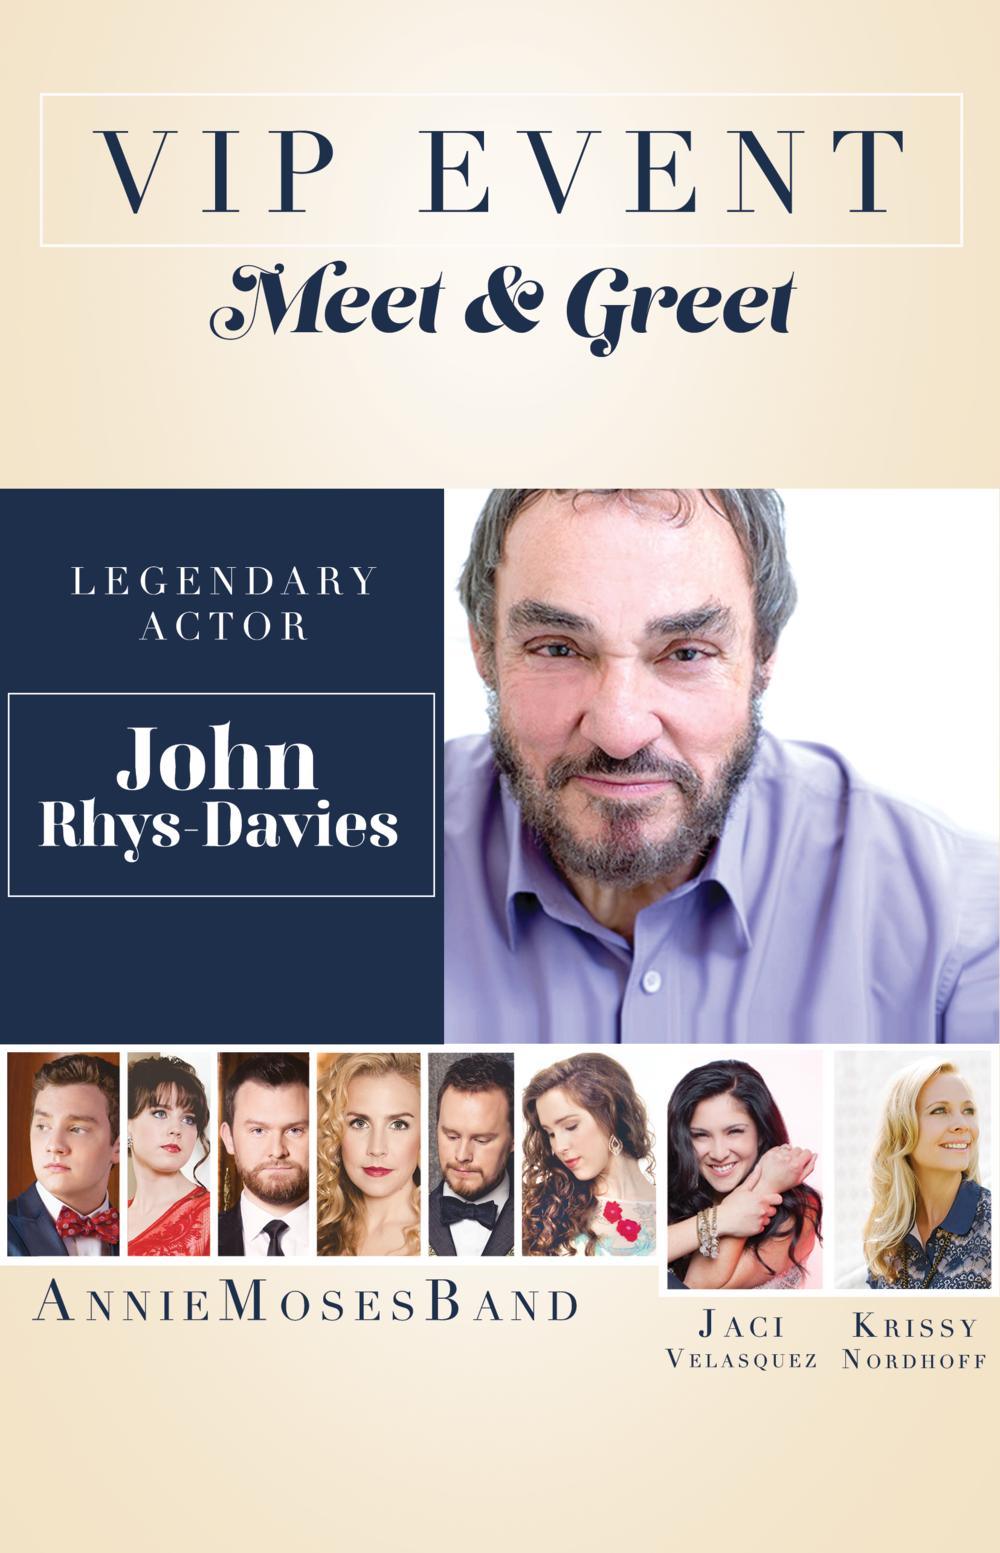 VIP Meet and Greet w/ John Rhys-Davies July 15.png